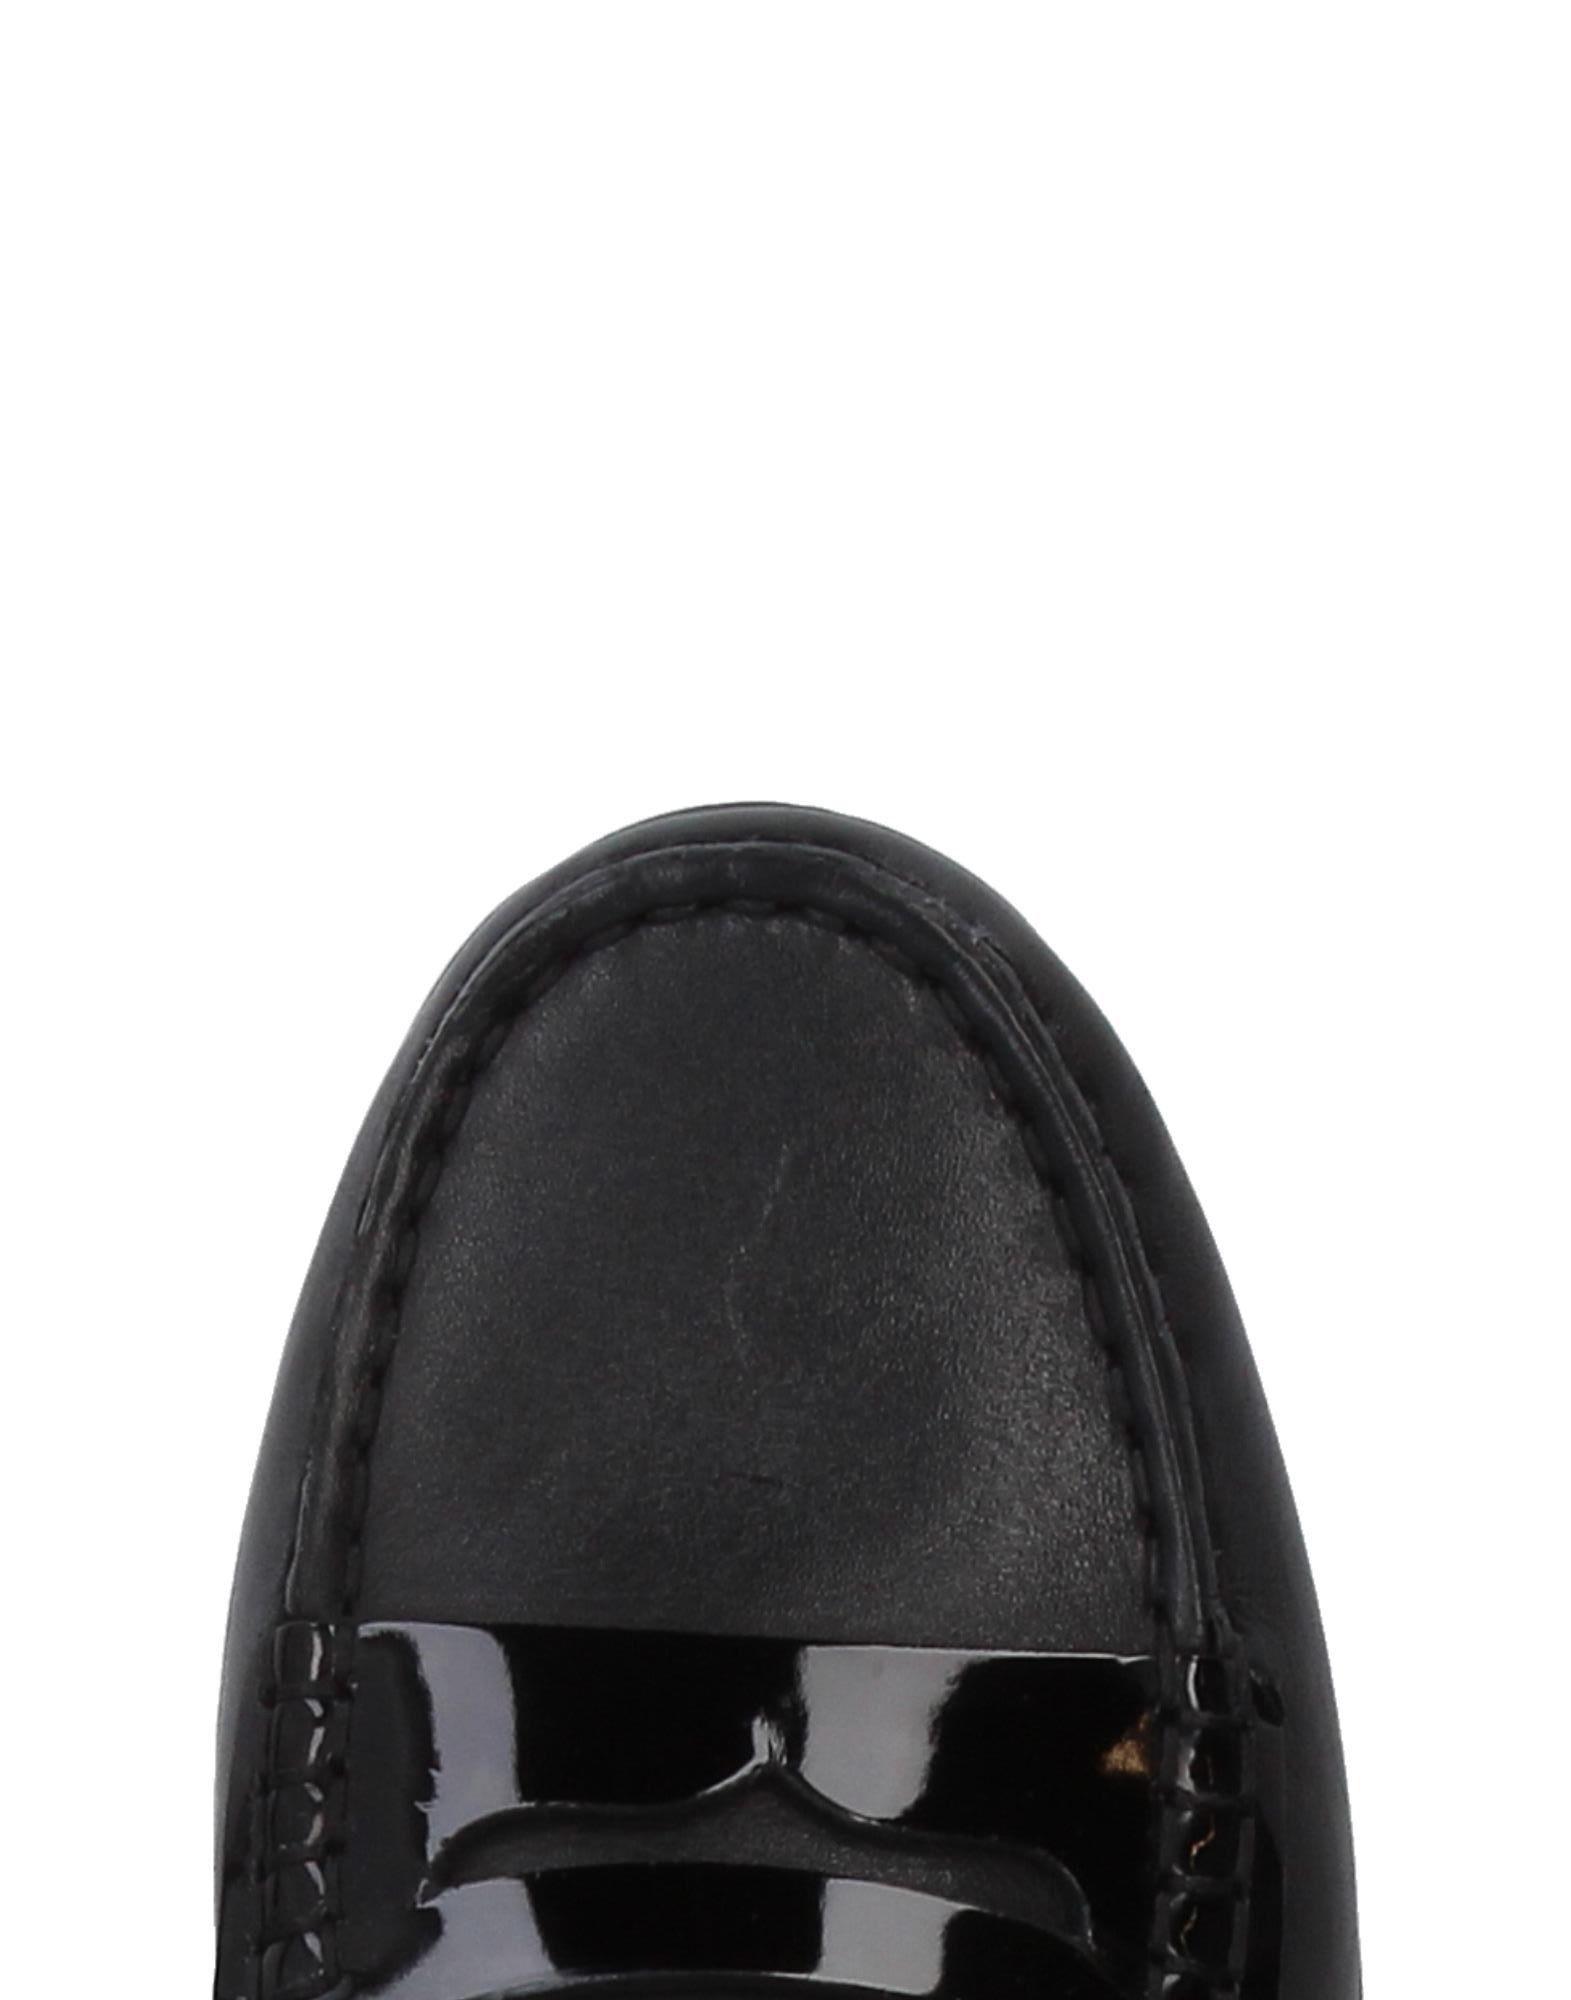 Geox Mokassins Damen  11390109DL Gute Qualität beliebte Schuhe